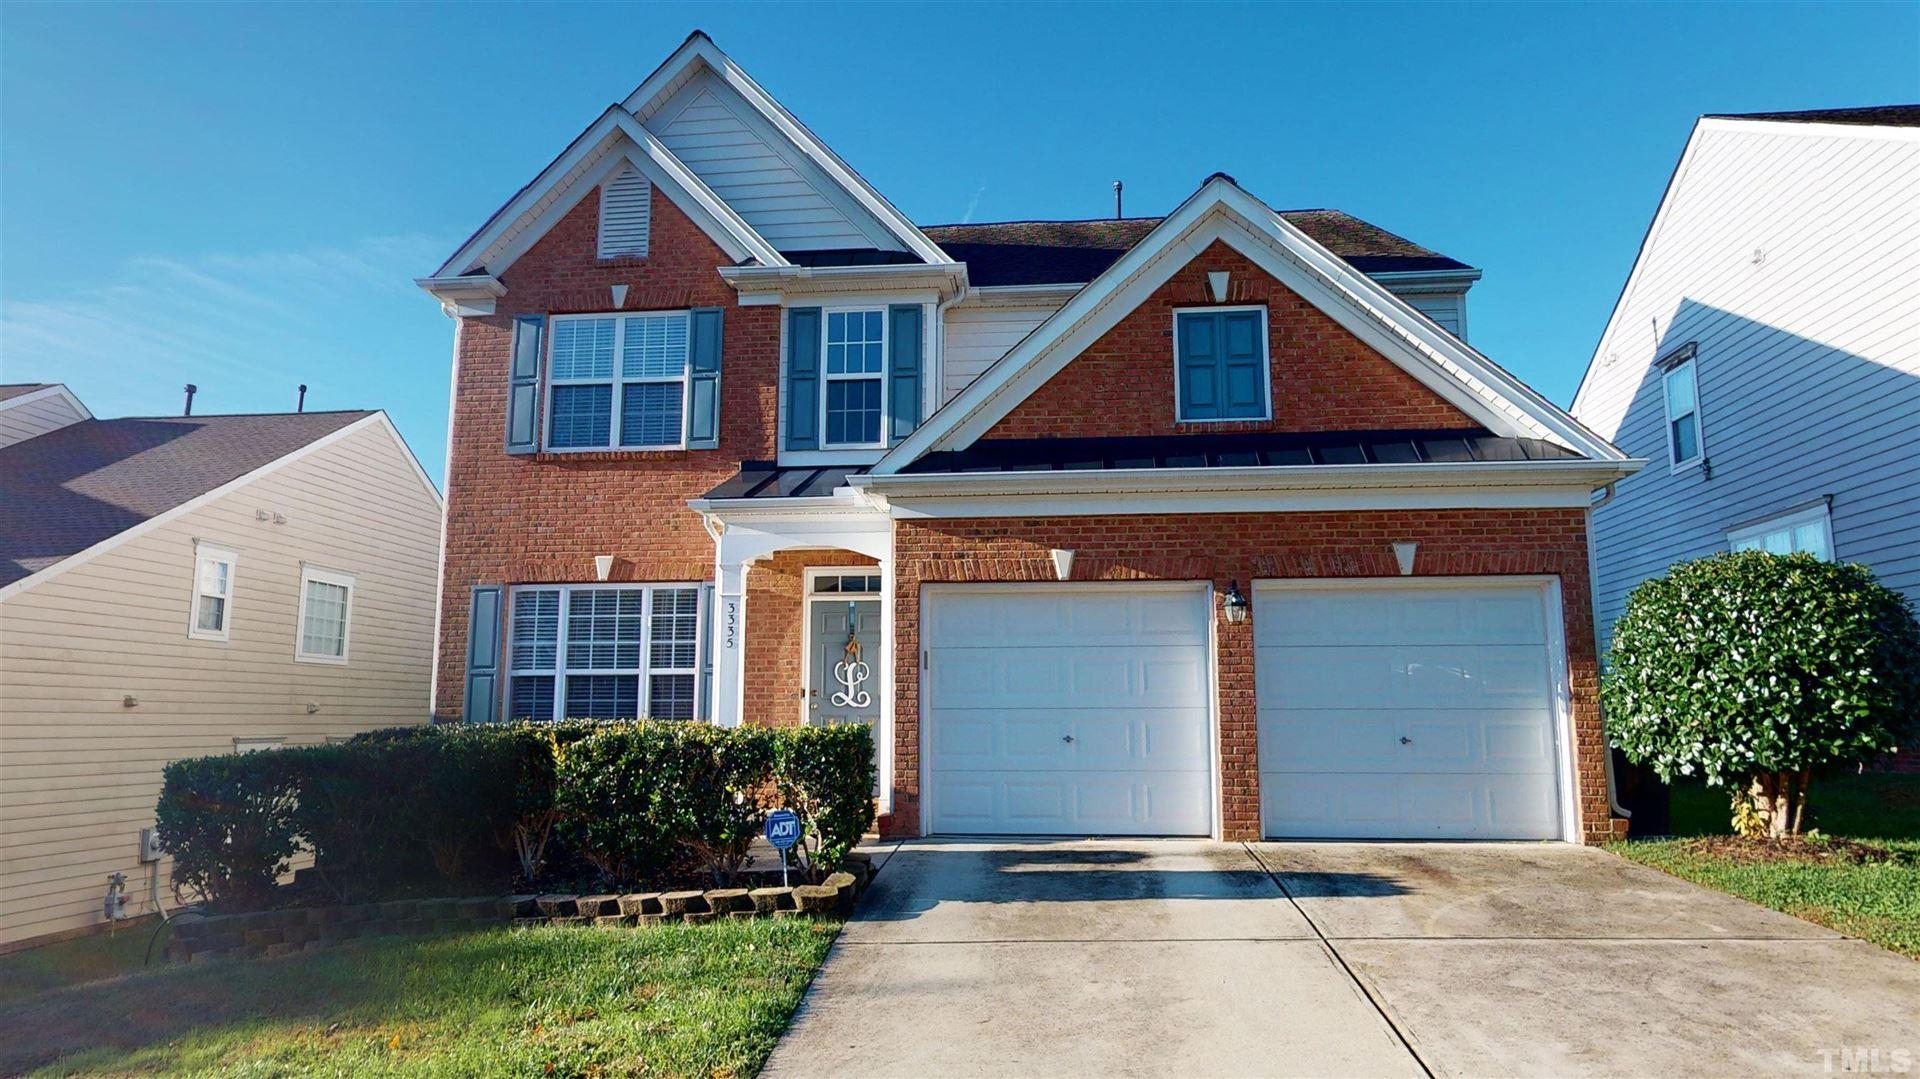 Photo of 3335 Sugar House Street, Raleigh, NC 27614-8484 (MLS # 2415599)